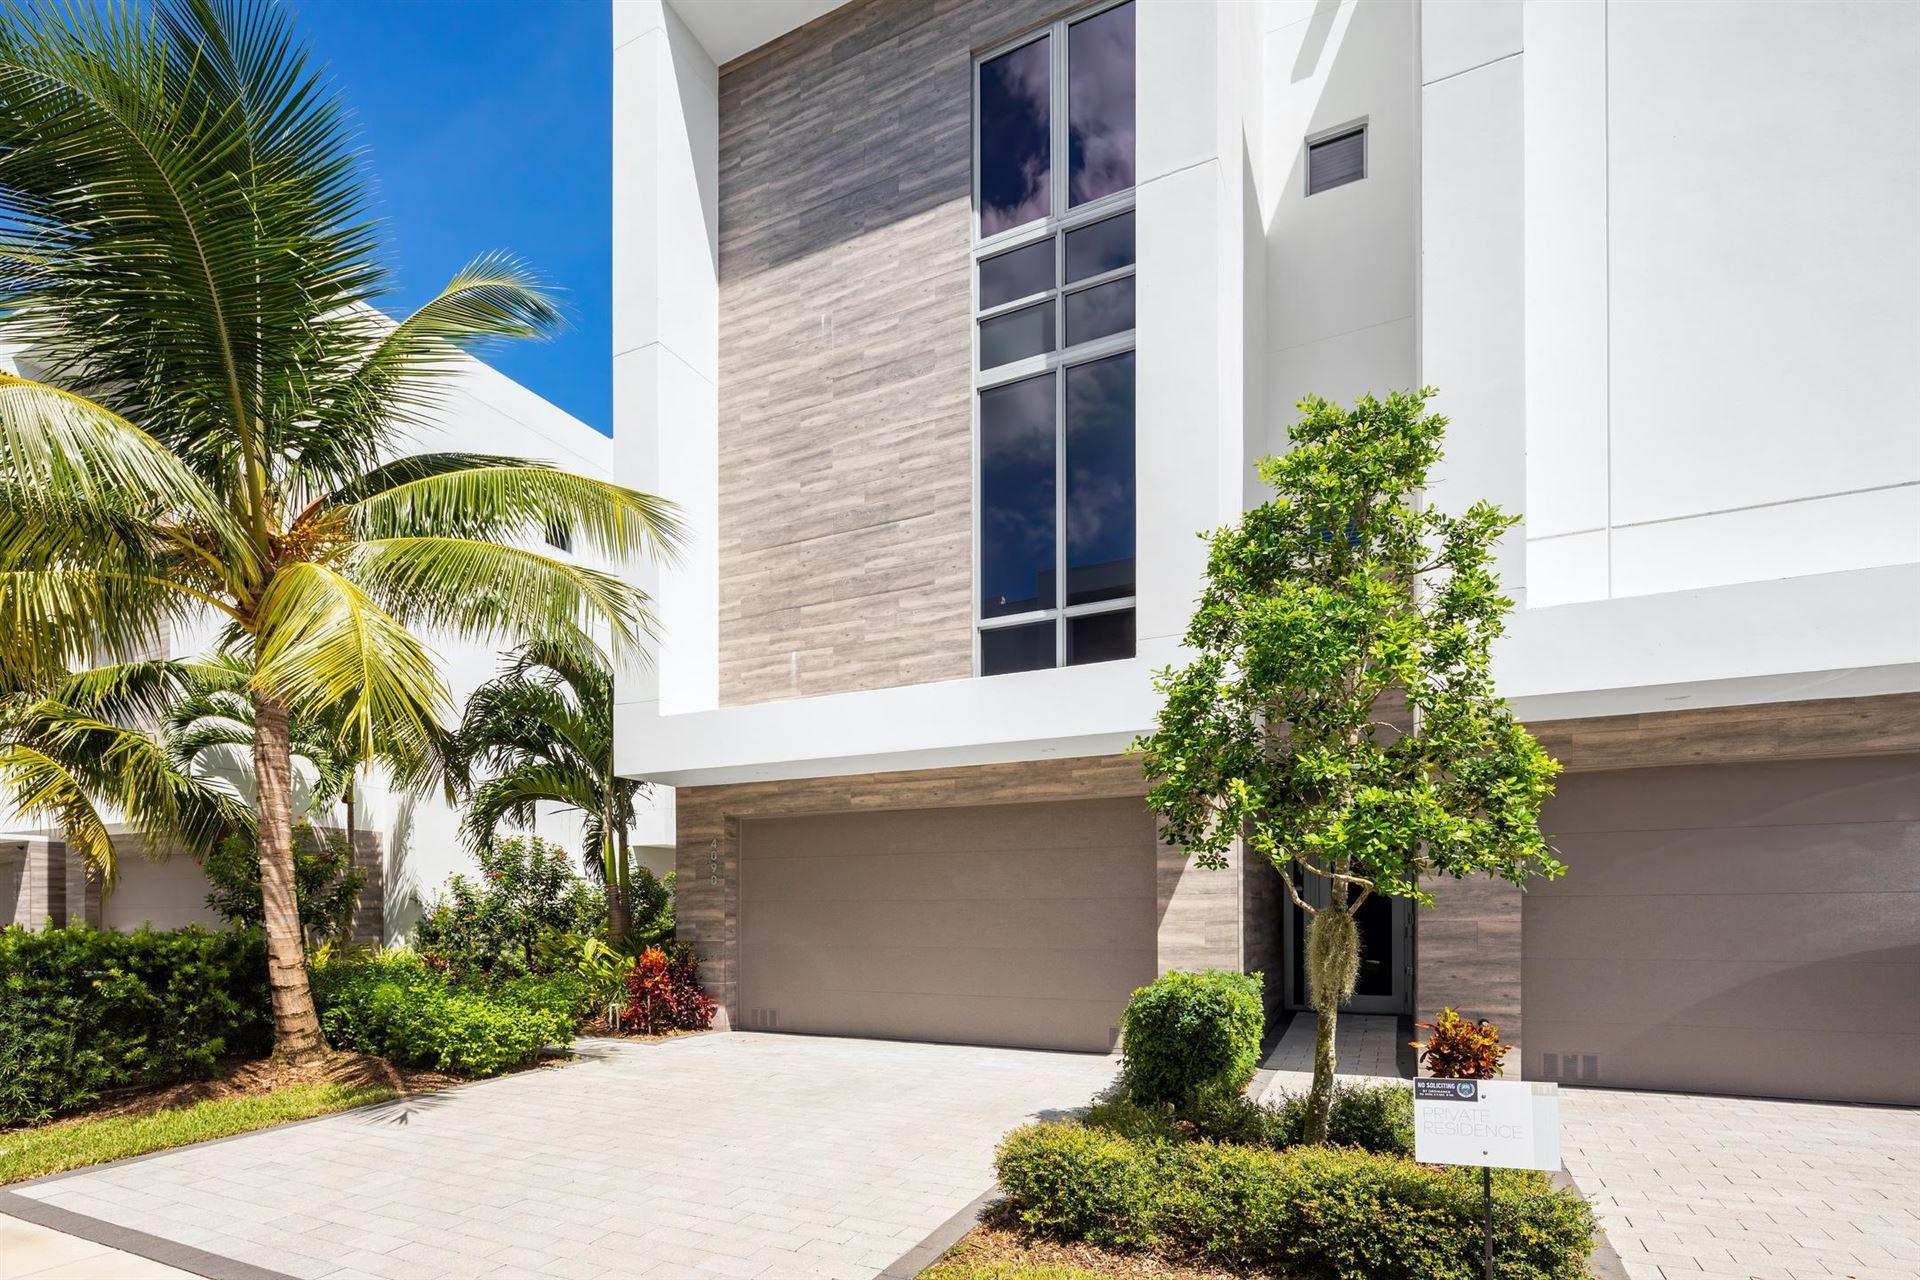 Photo of 4030 NW 17th Avenue, Boca Raton, FL 33431 (MLS # RX-10657956)